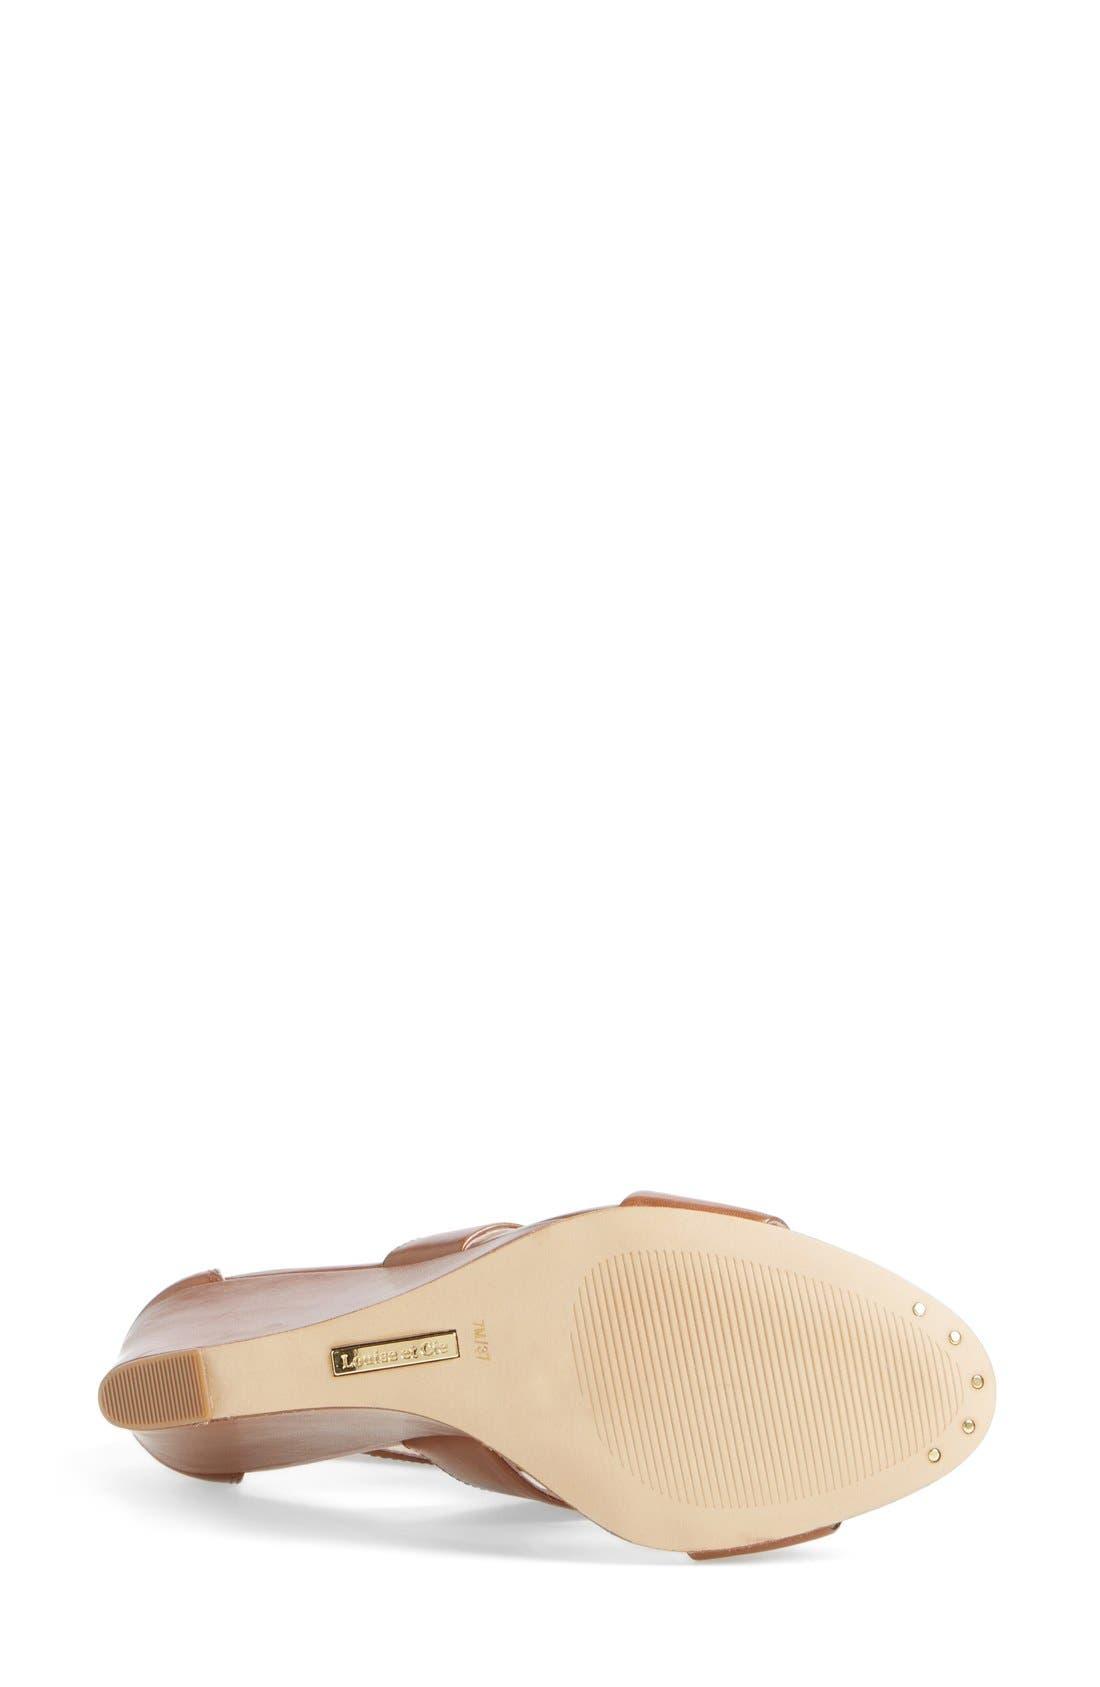 Alternate Image 4  - Louise et Cie 'Rozza' Leather Wedge Sandal (Women)